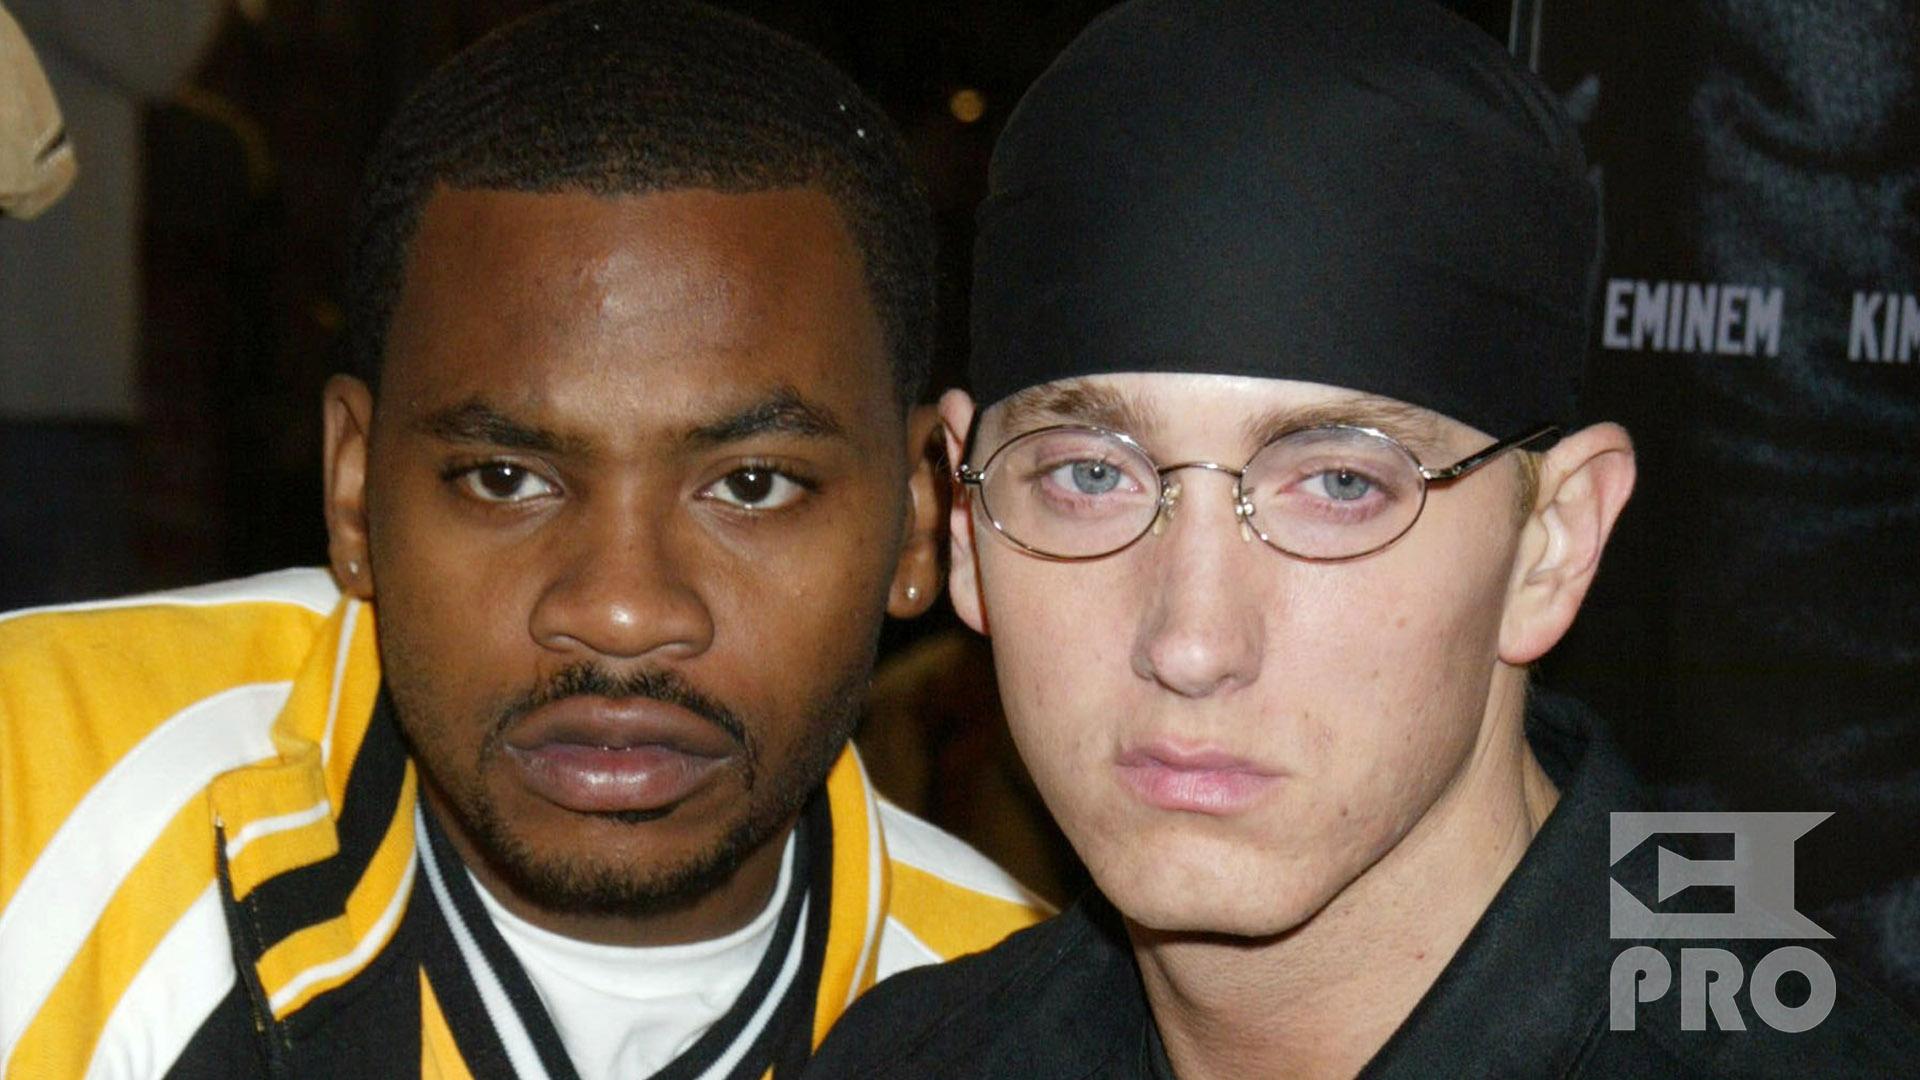 Eminem and Obie Trice